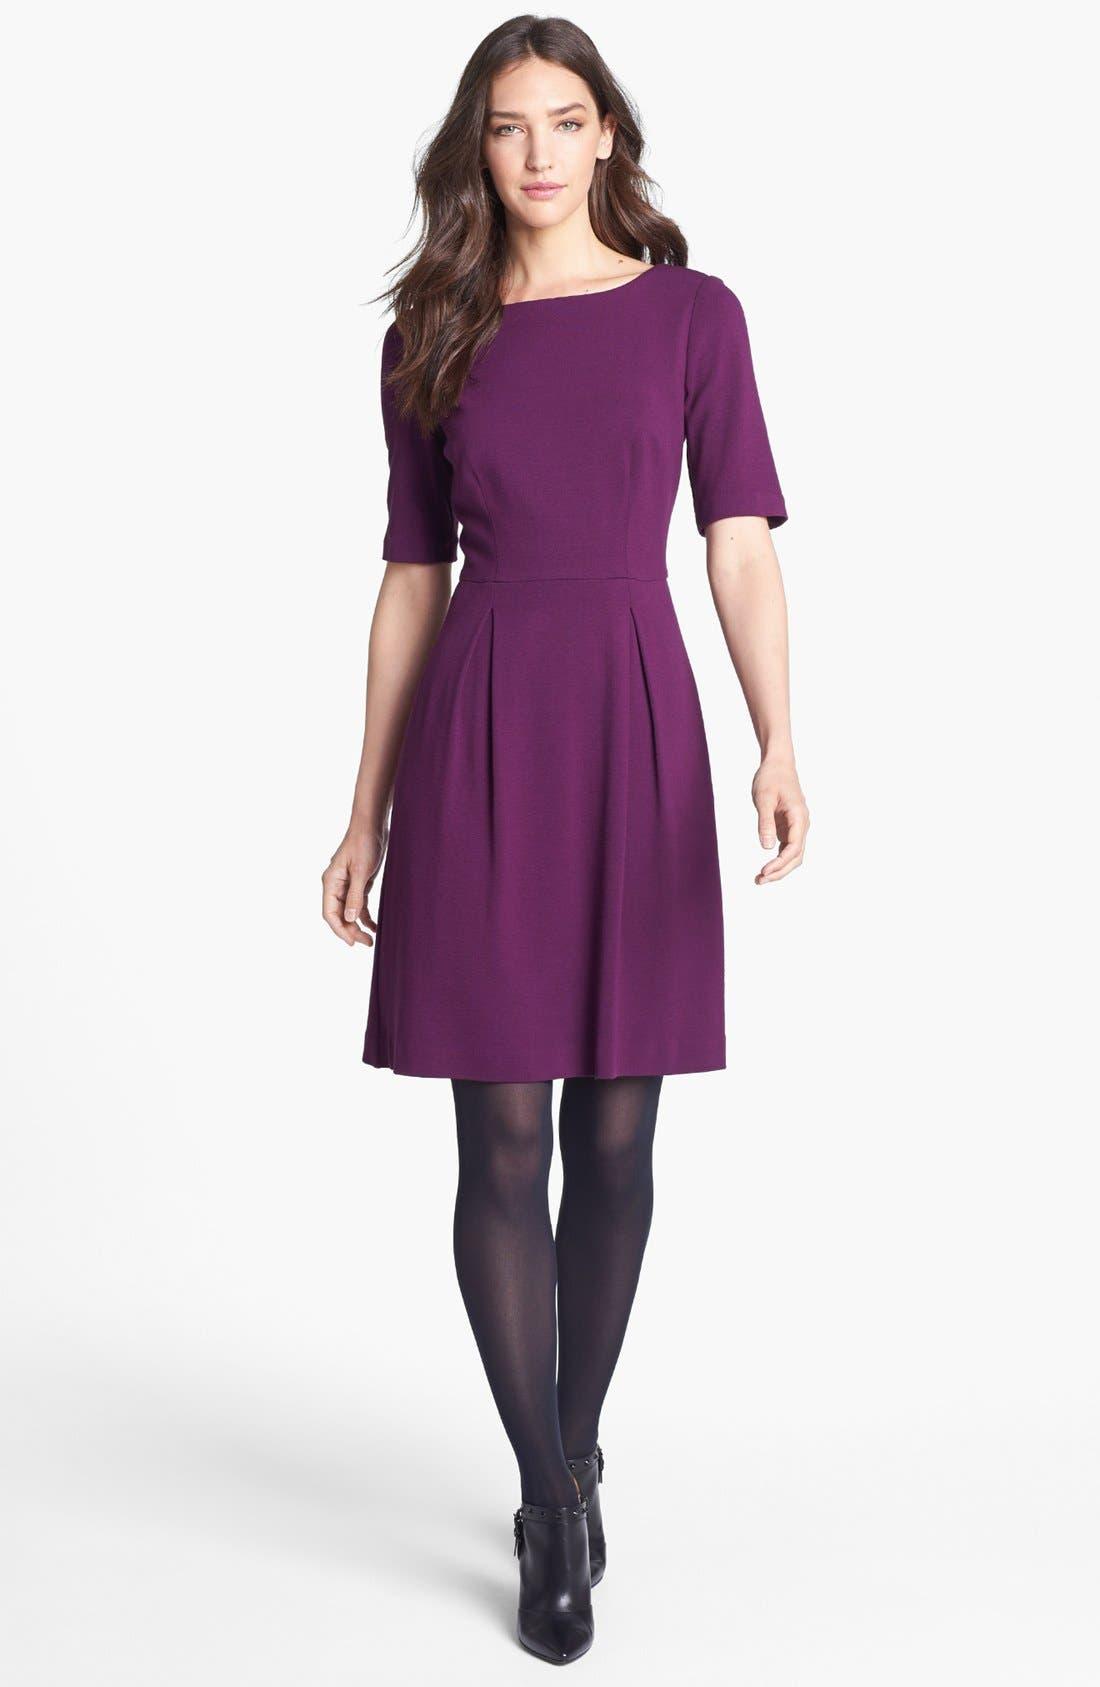 Alternate Image 1 Selected - Trina Turk Ponte Knit A-Line Dress